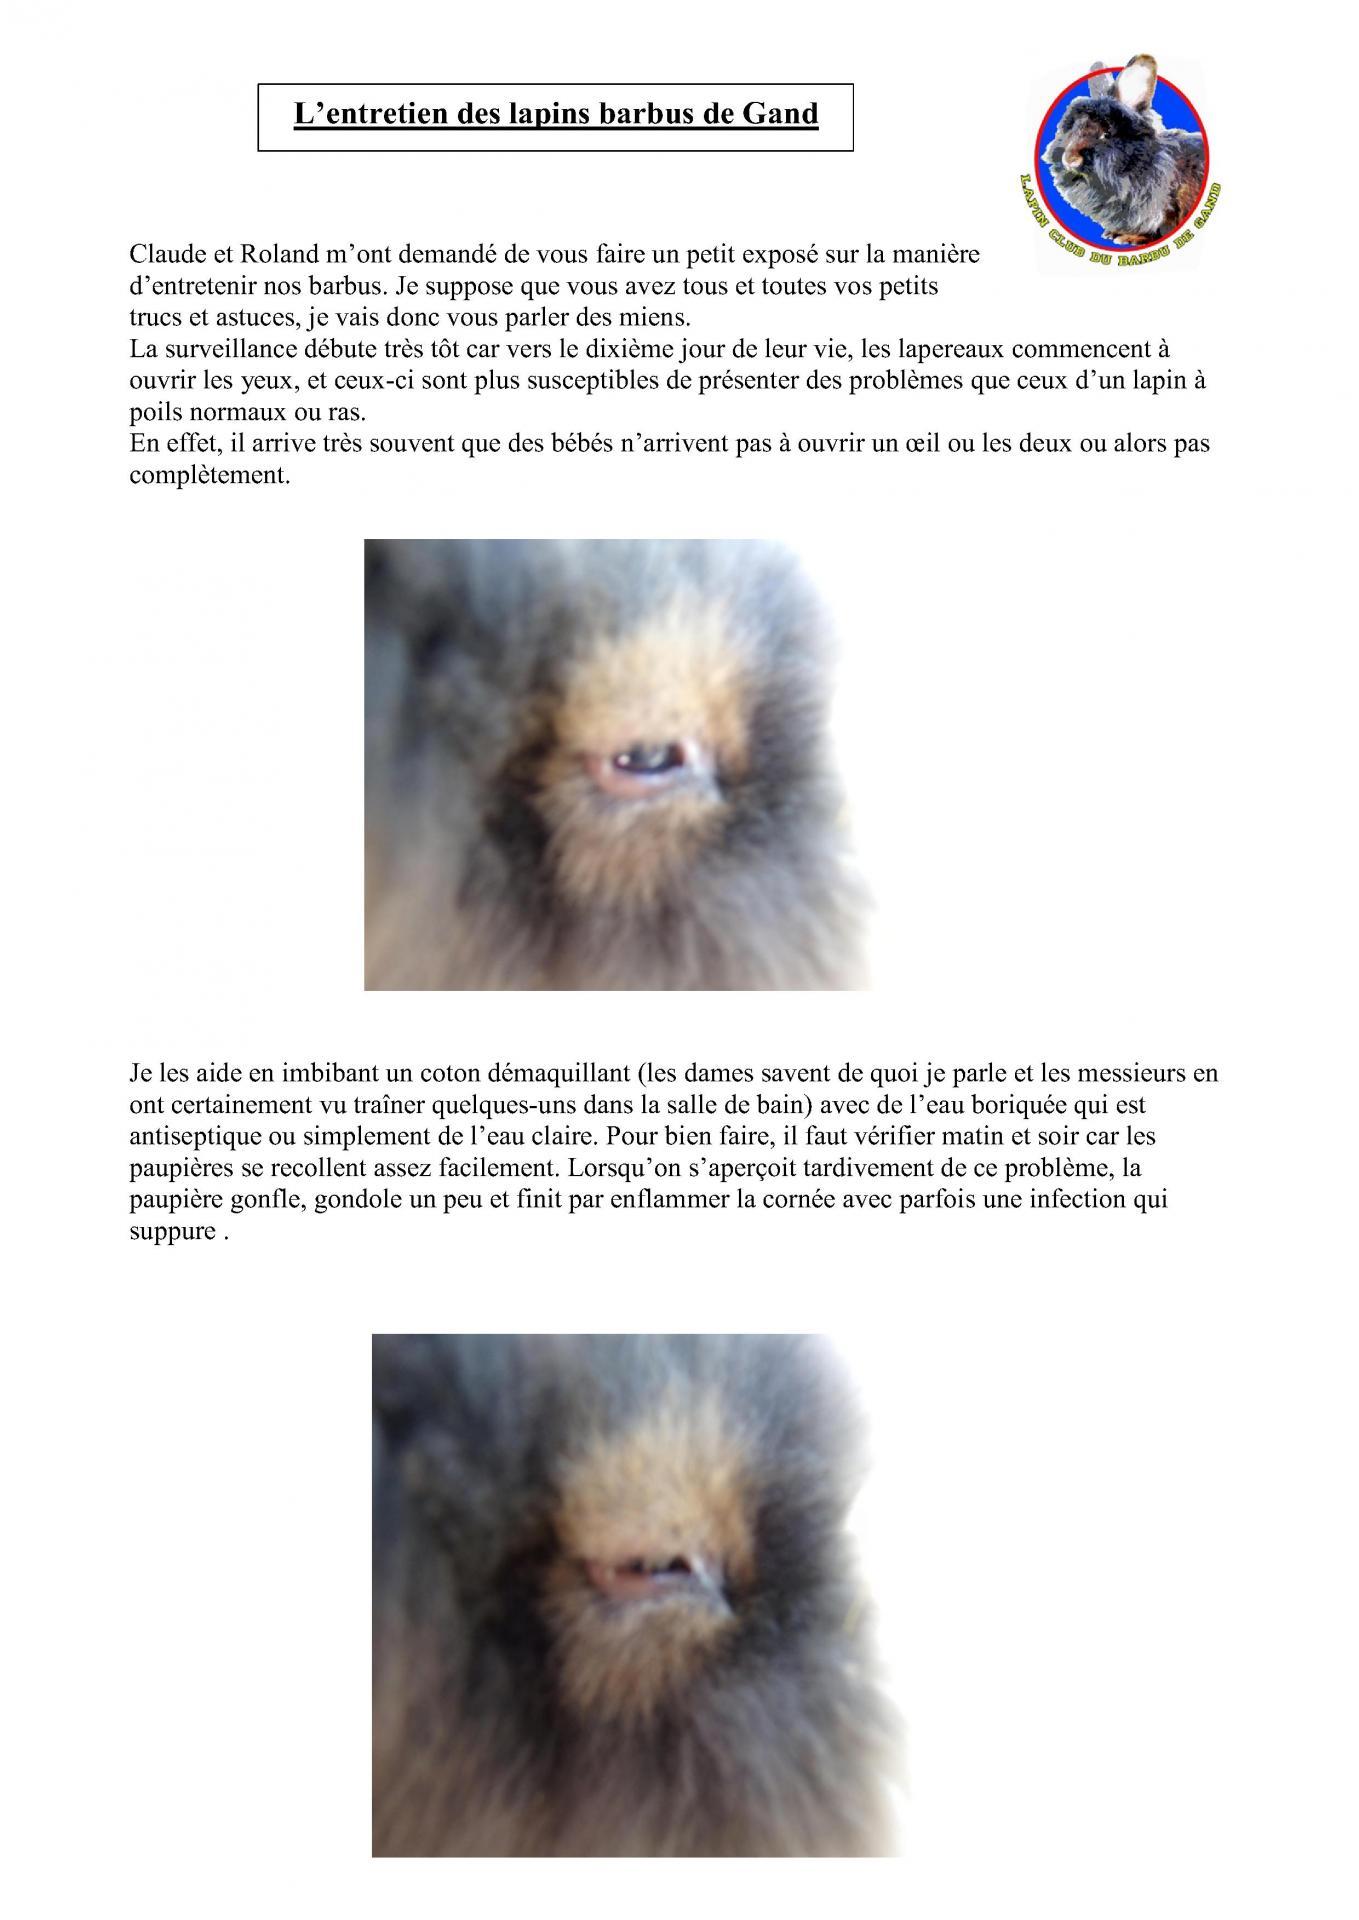 Expose leudon l entretien du barbu 1